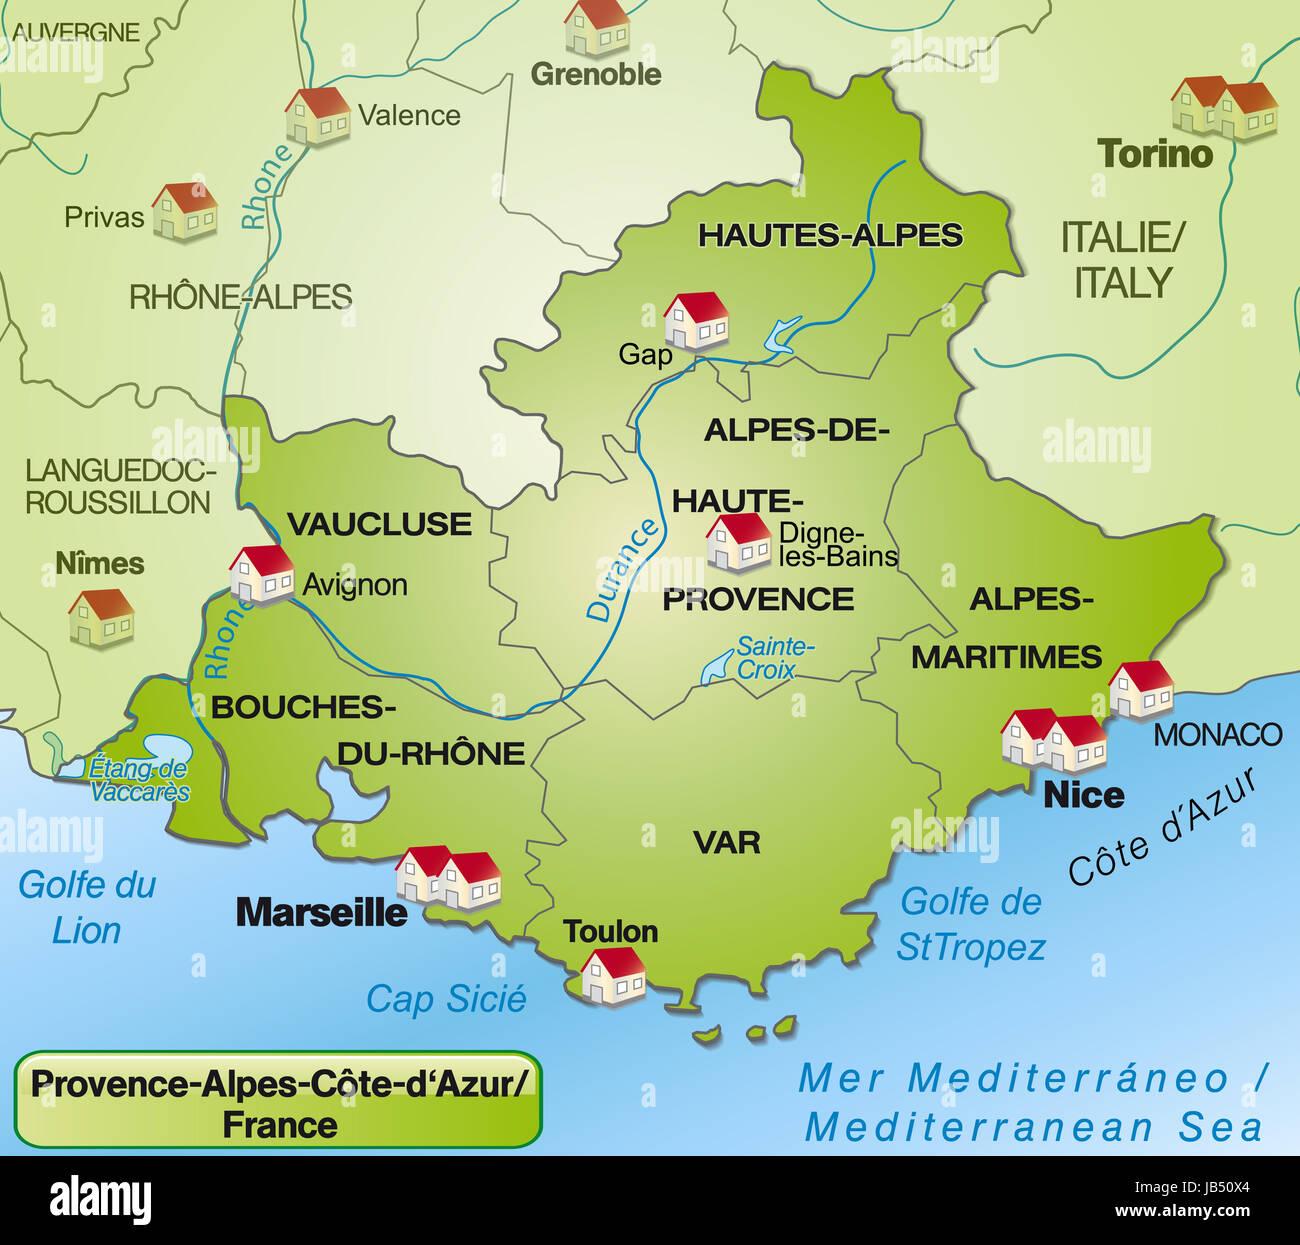 frankreich landkarte provence Provence Alpes Côte d´Azur in Frankreich als Umgebungskarte mit